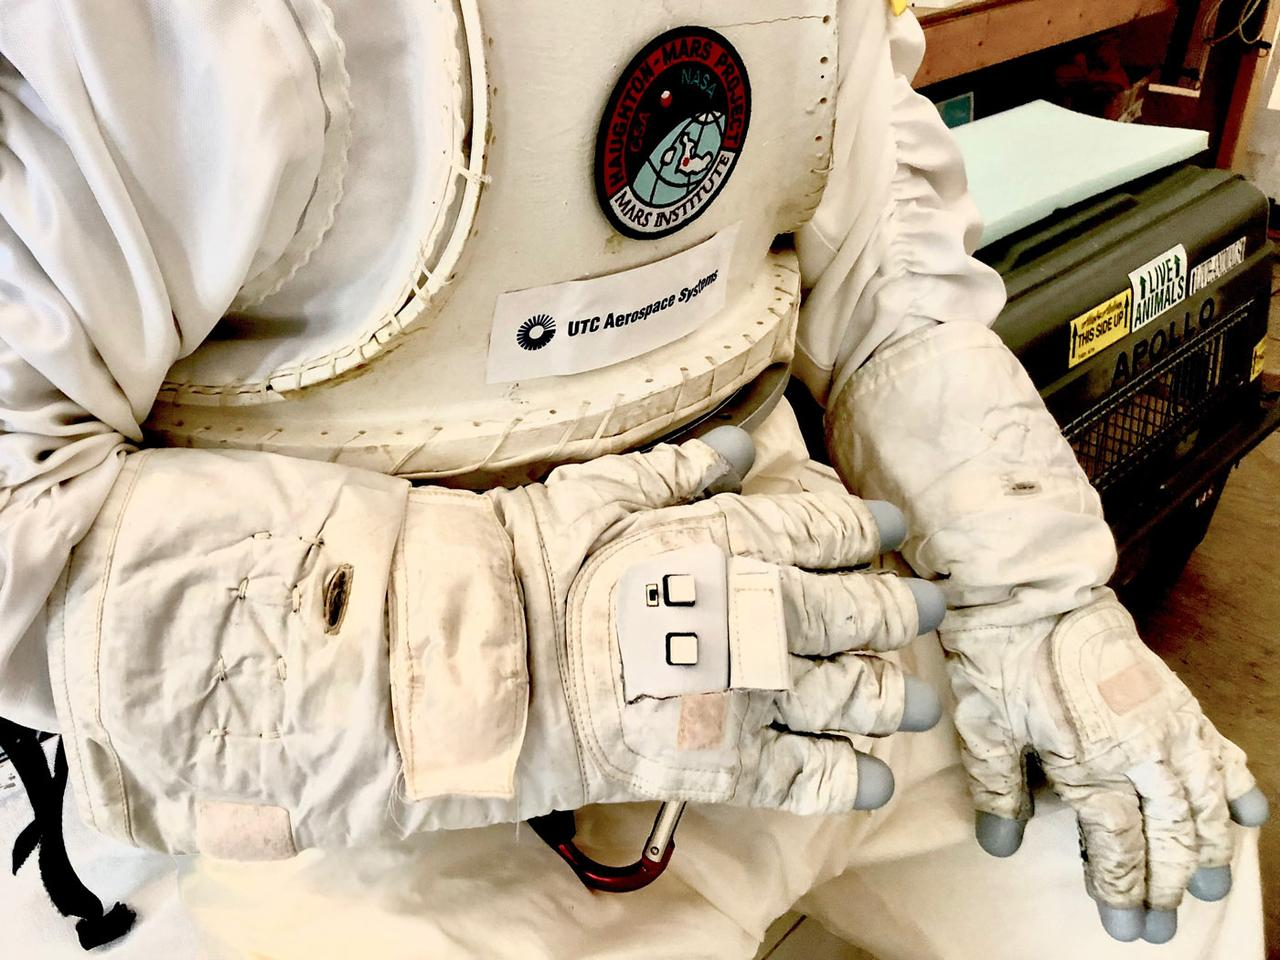 """Smart glove"" designed to let astronauts control drones"